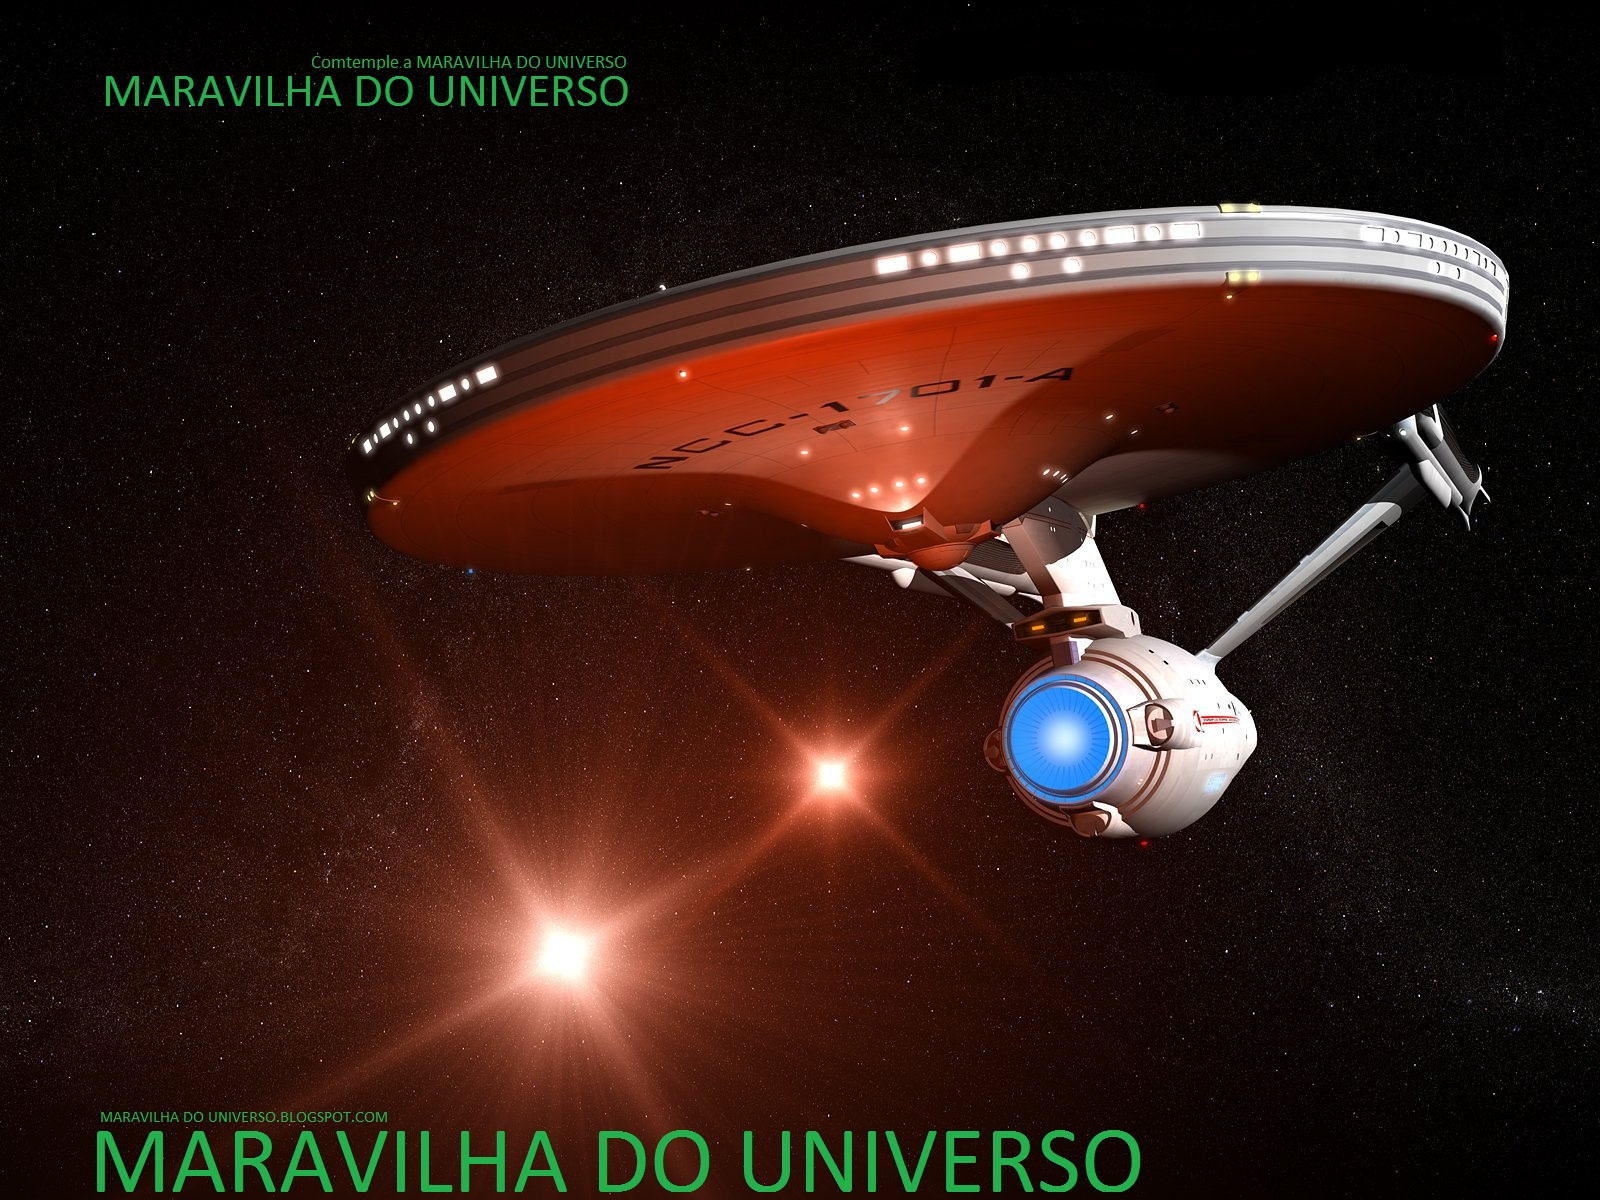 MARAVILHA DO UNIVERSO